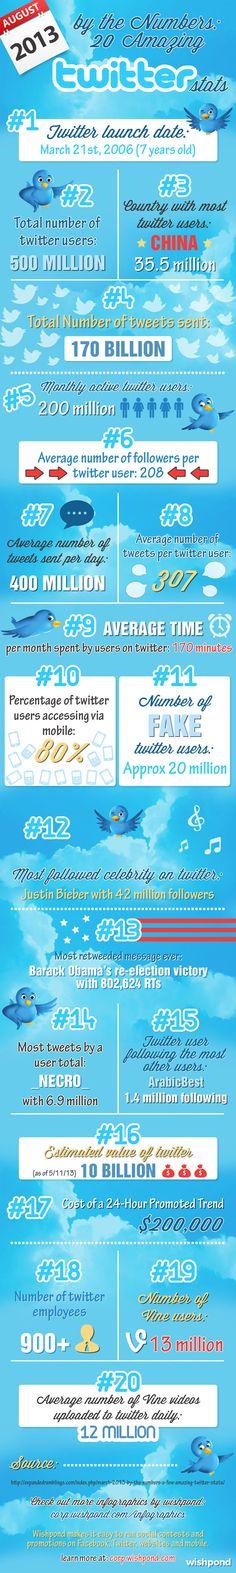 Twitter in Zahlen: Eine halbe Milliarde Nutzer, 400 Millionen Tweets am Tag | Kroker's Look @ IT